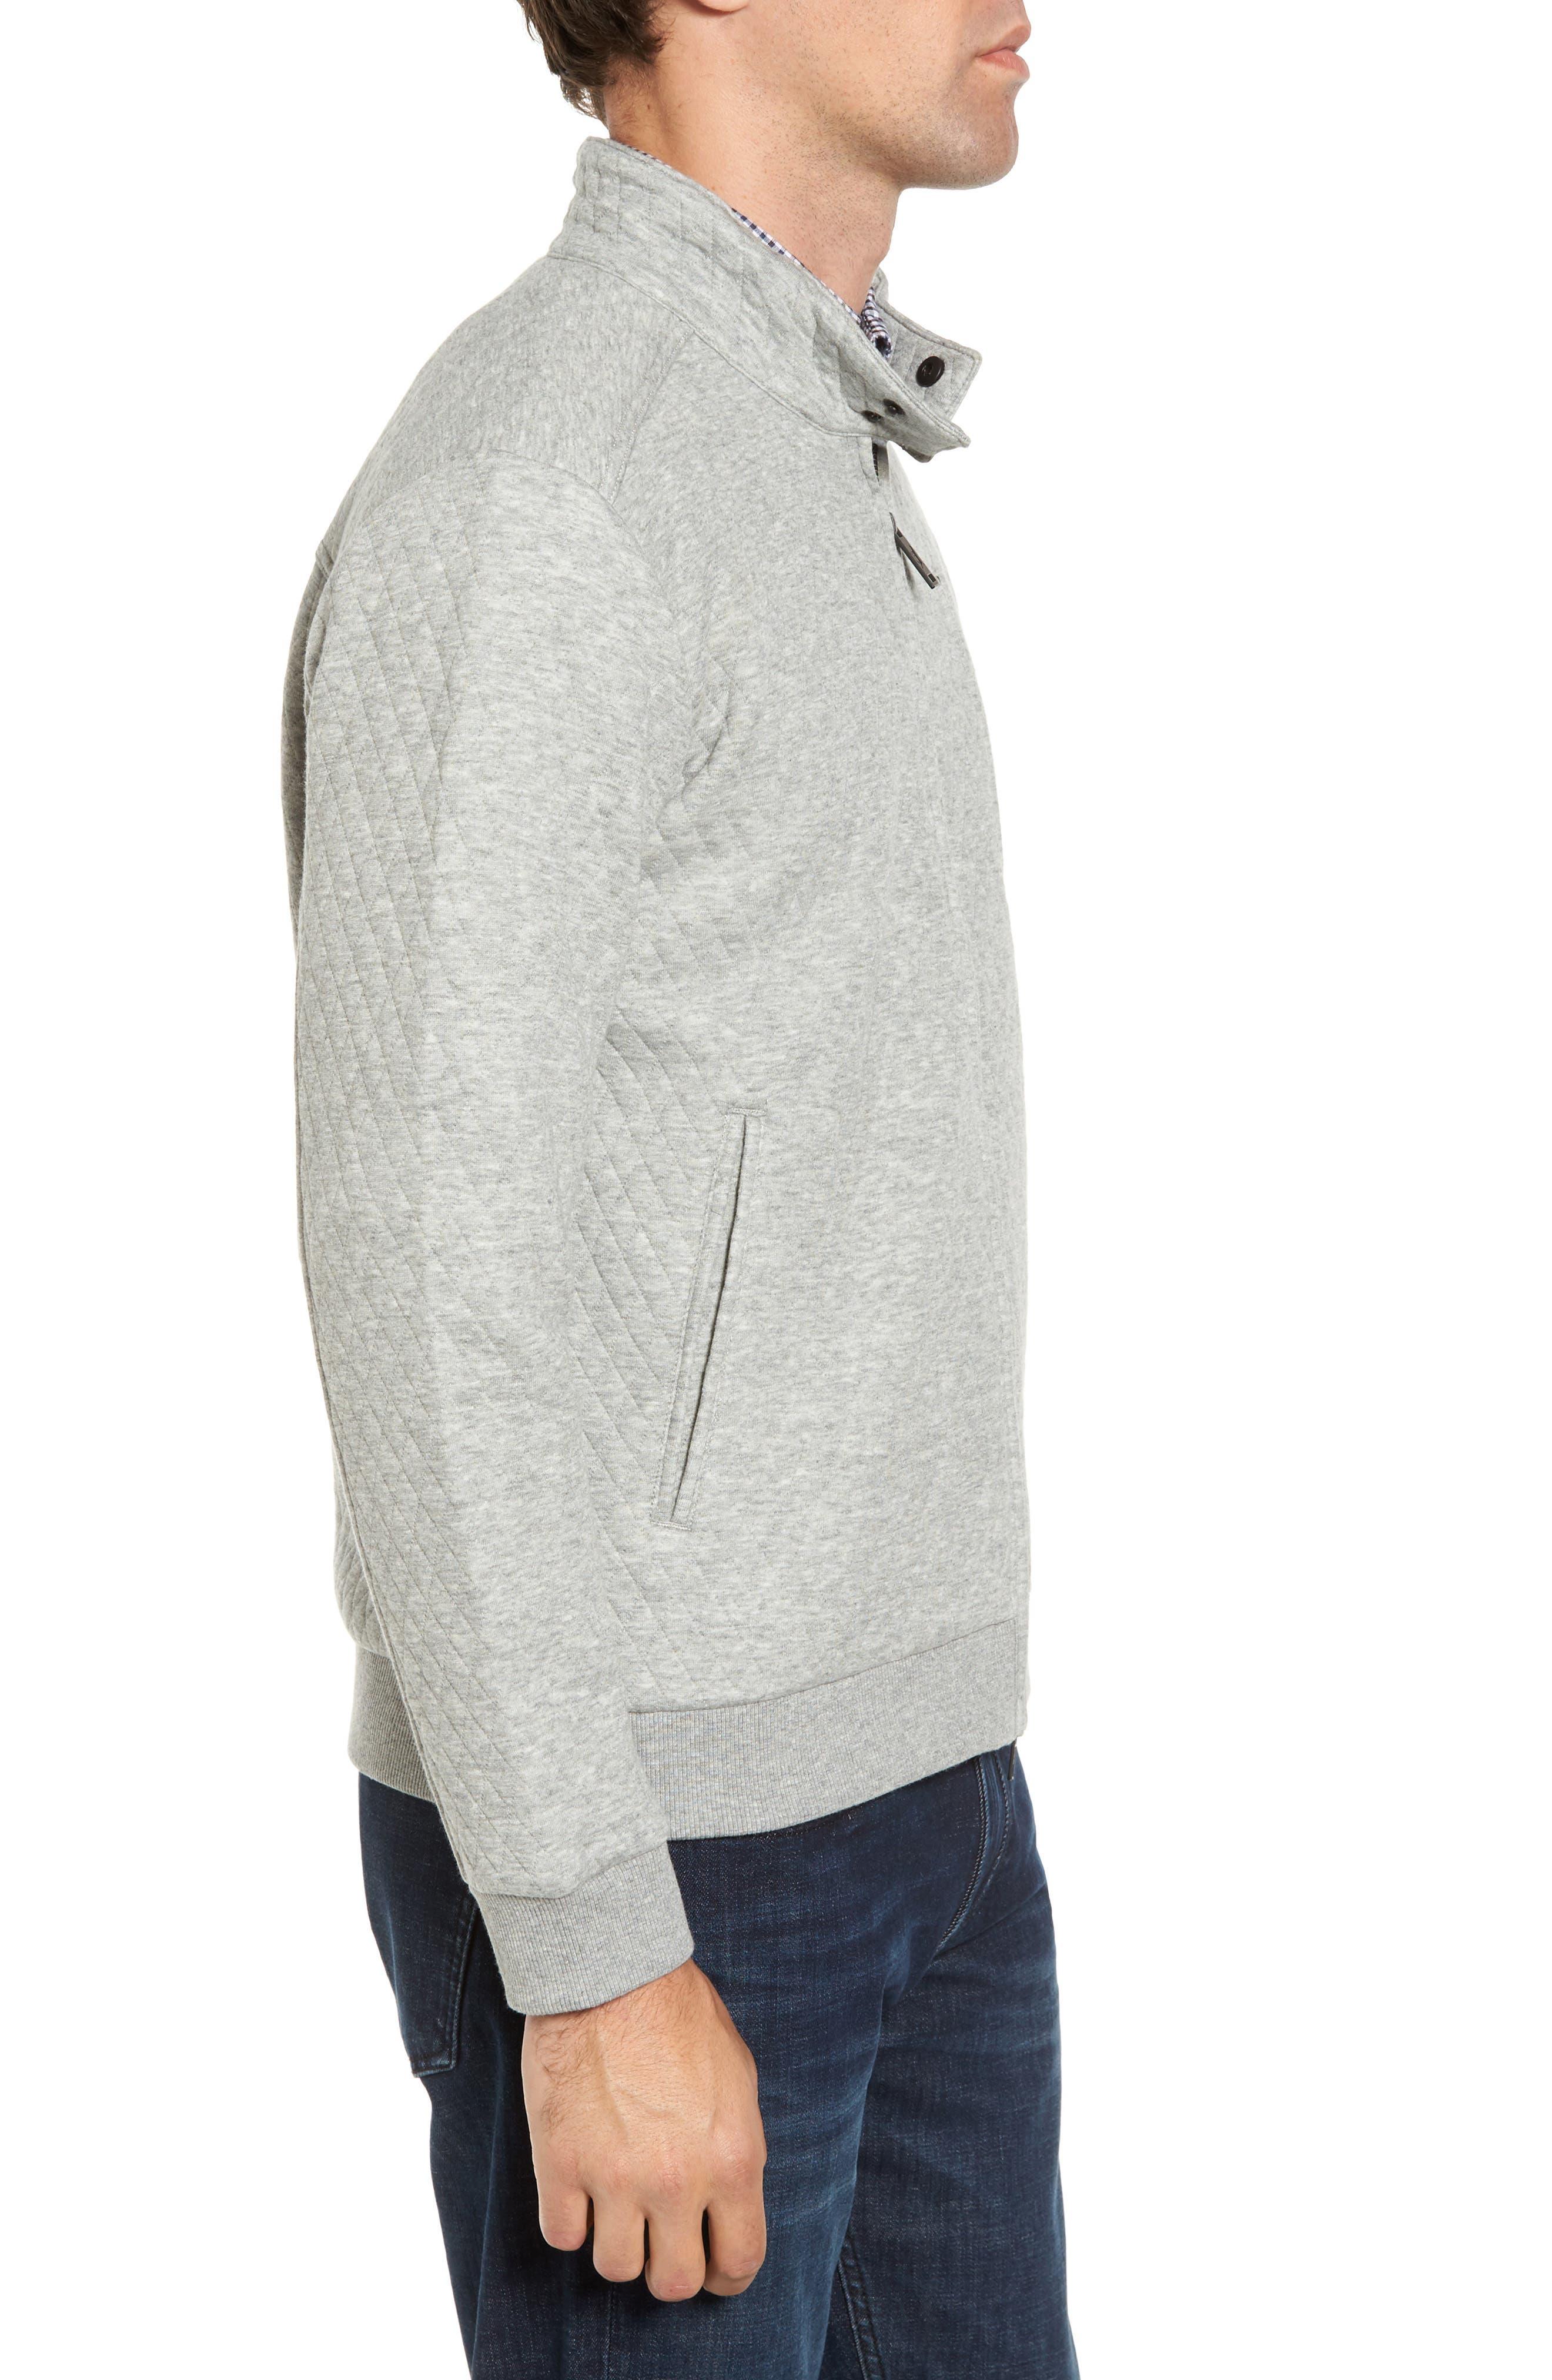 RODD & GUNN, Skipjack Pass Quilted Fleece Jacket, Alternate thumbnail 3, color, ASH